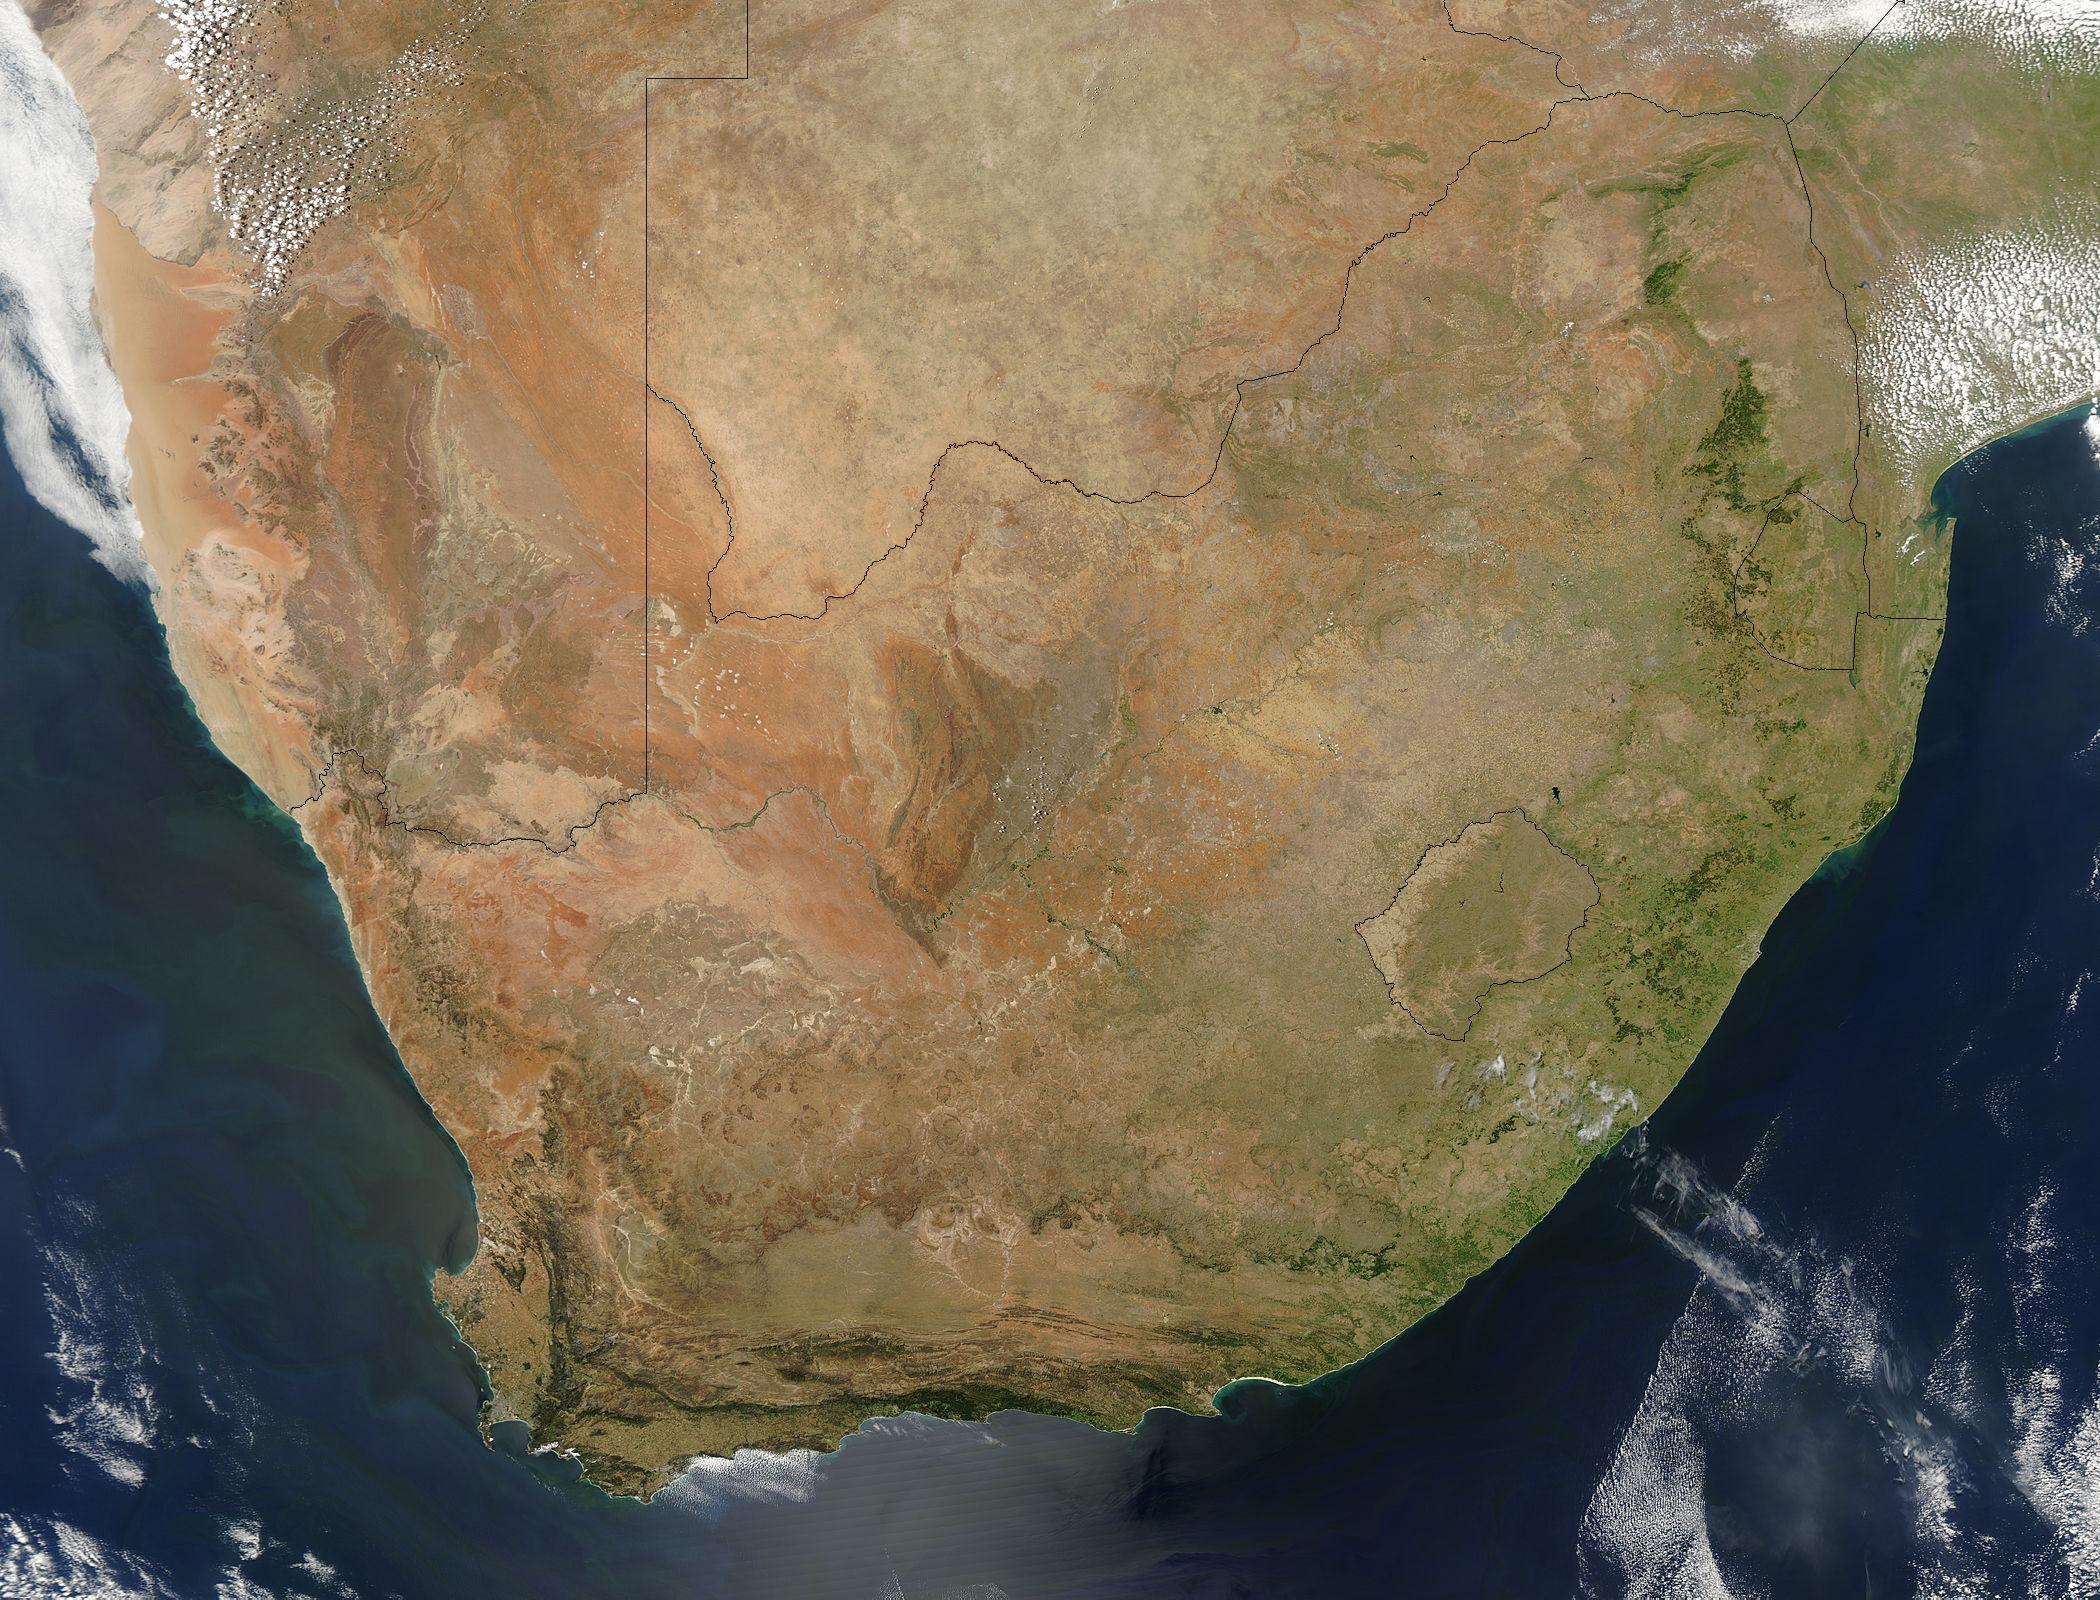 SouthAfrica.A2004305.1210.1km